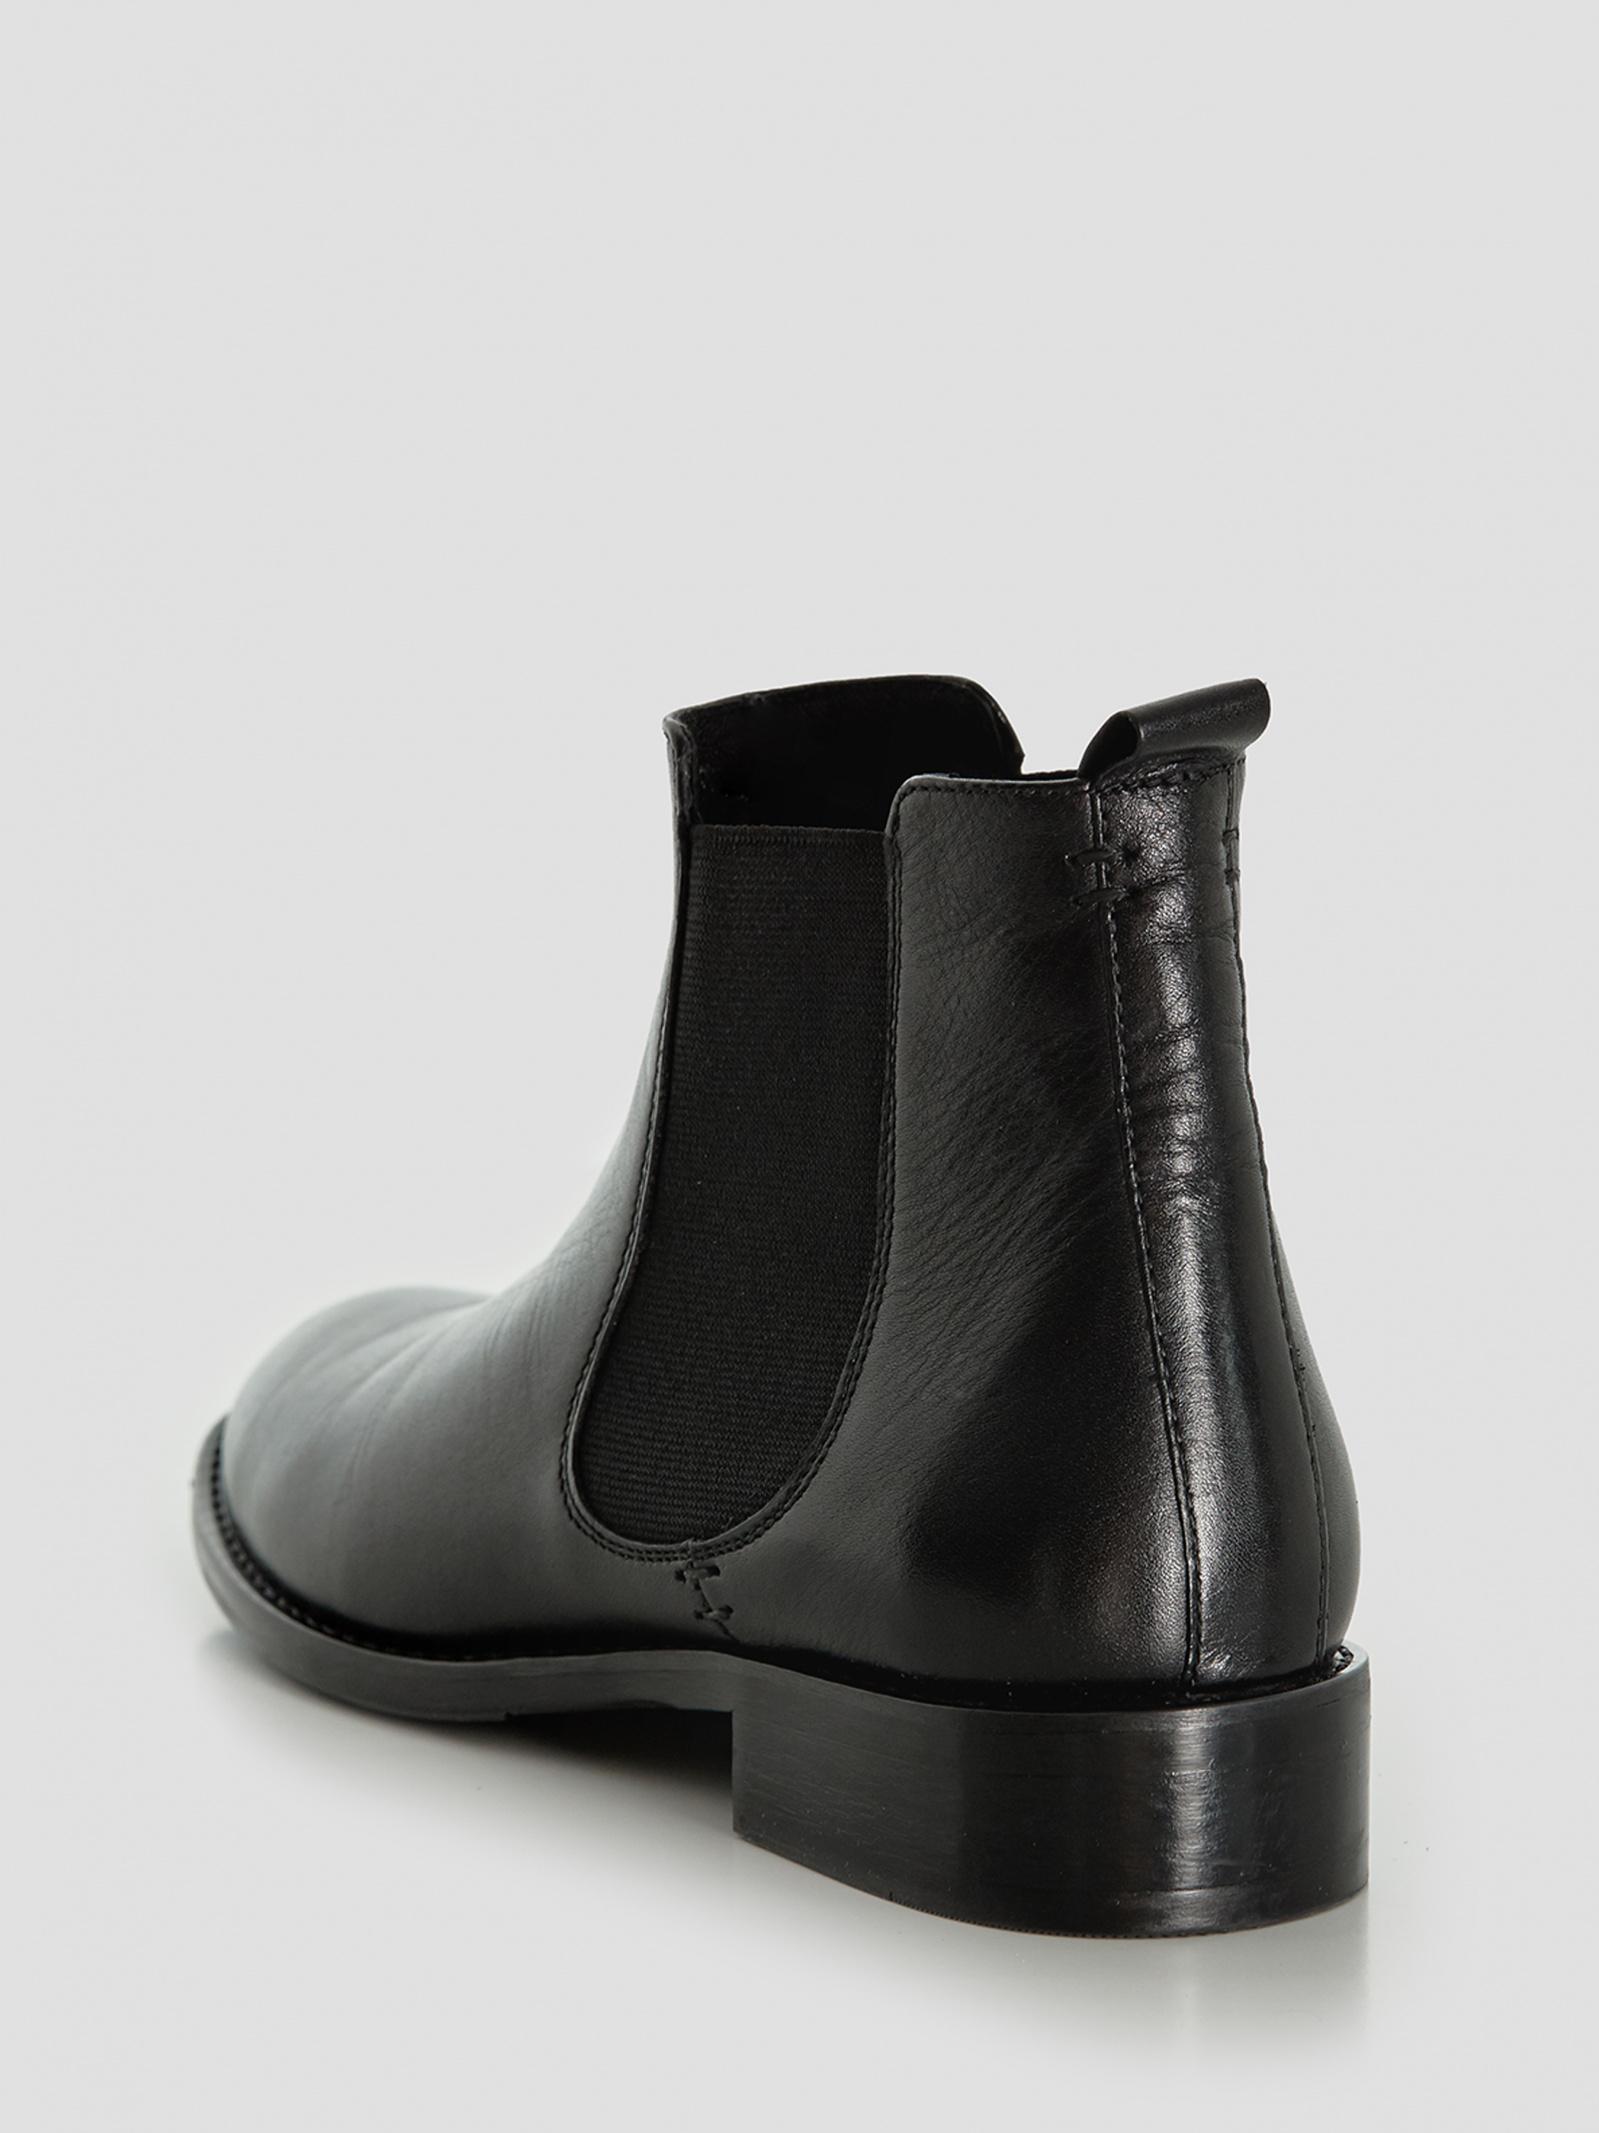 Ботинки для женщин Natali Bolgar BT001KJN1BK90 смотреть, 2017